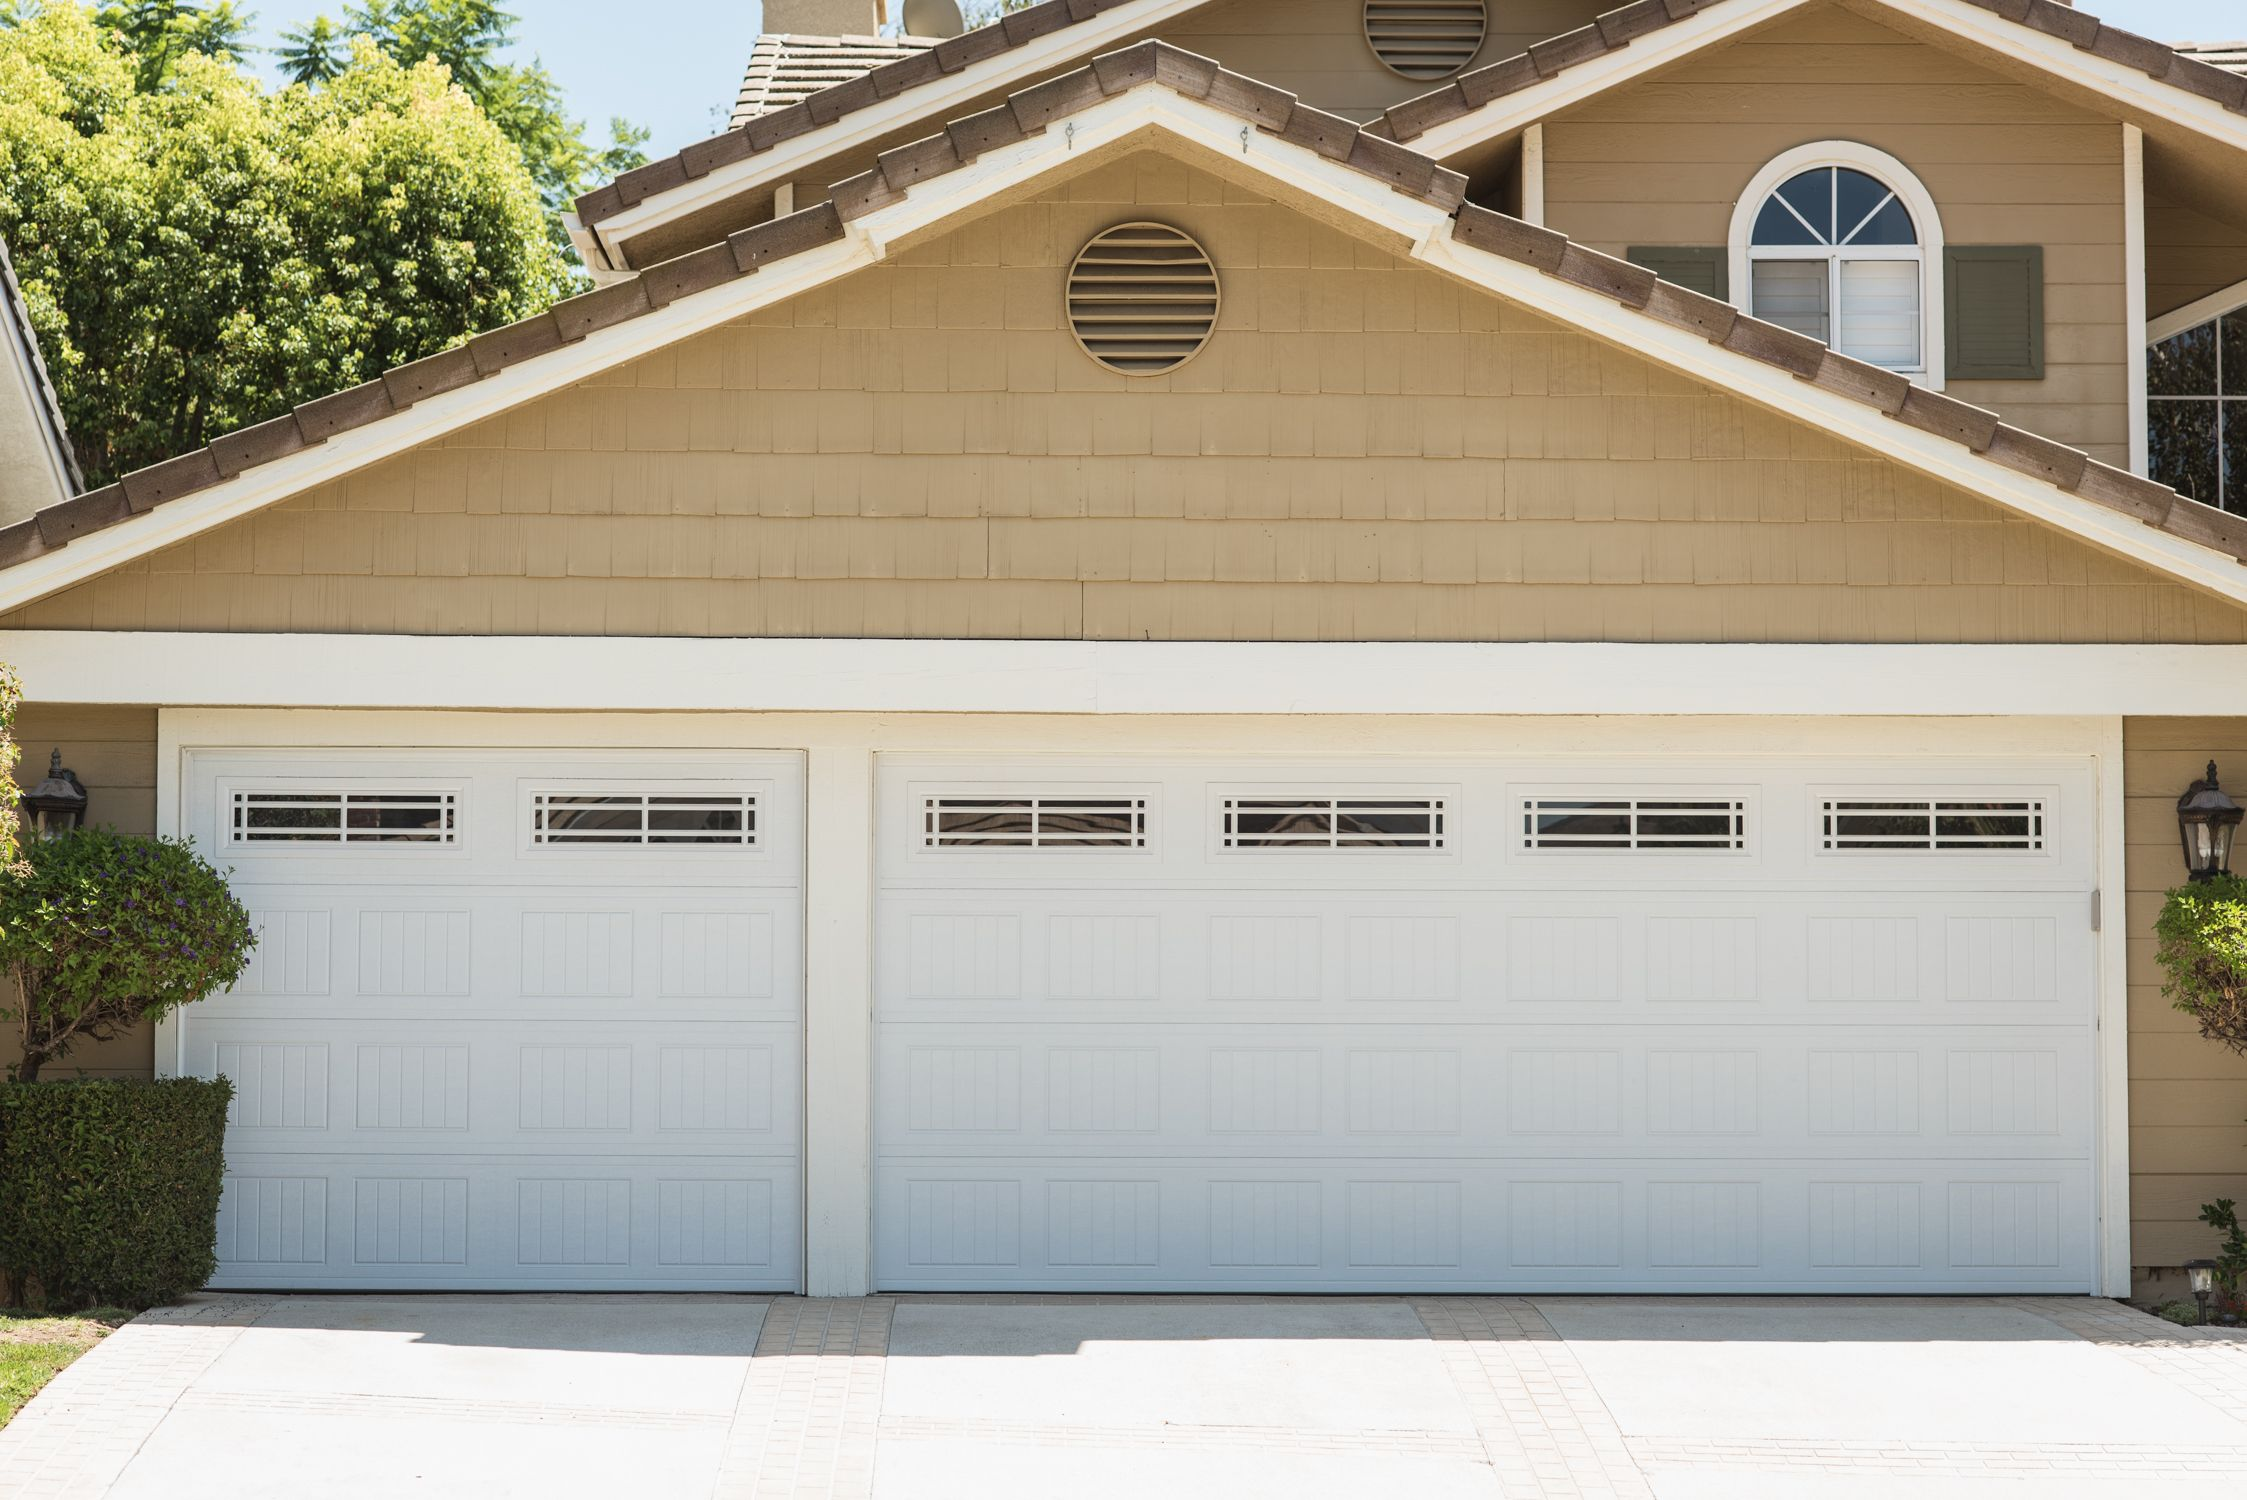 Beautiful 16 X 7 8 X 7 Wayne Dalton 8000 Sonoma Doors With Prairie 2 Windows Los Angeles Ca Ph Residential Garage Doors Garage Doors Garage Doors For Sale